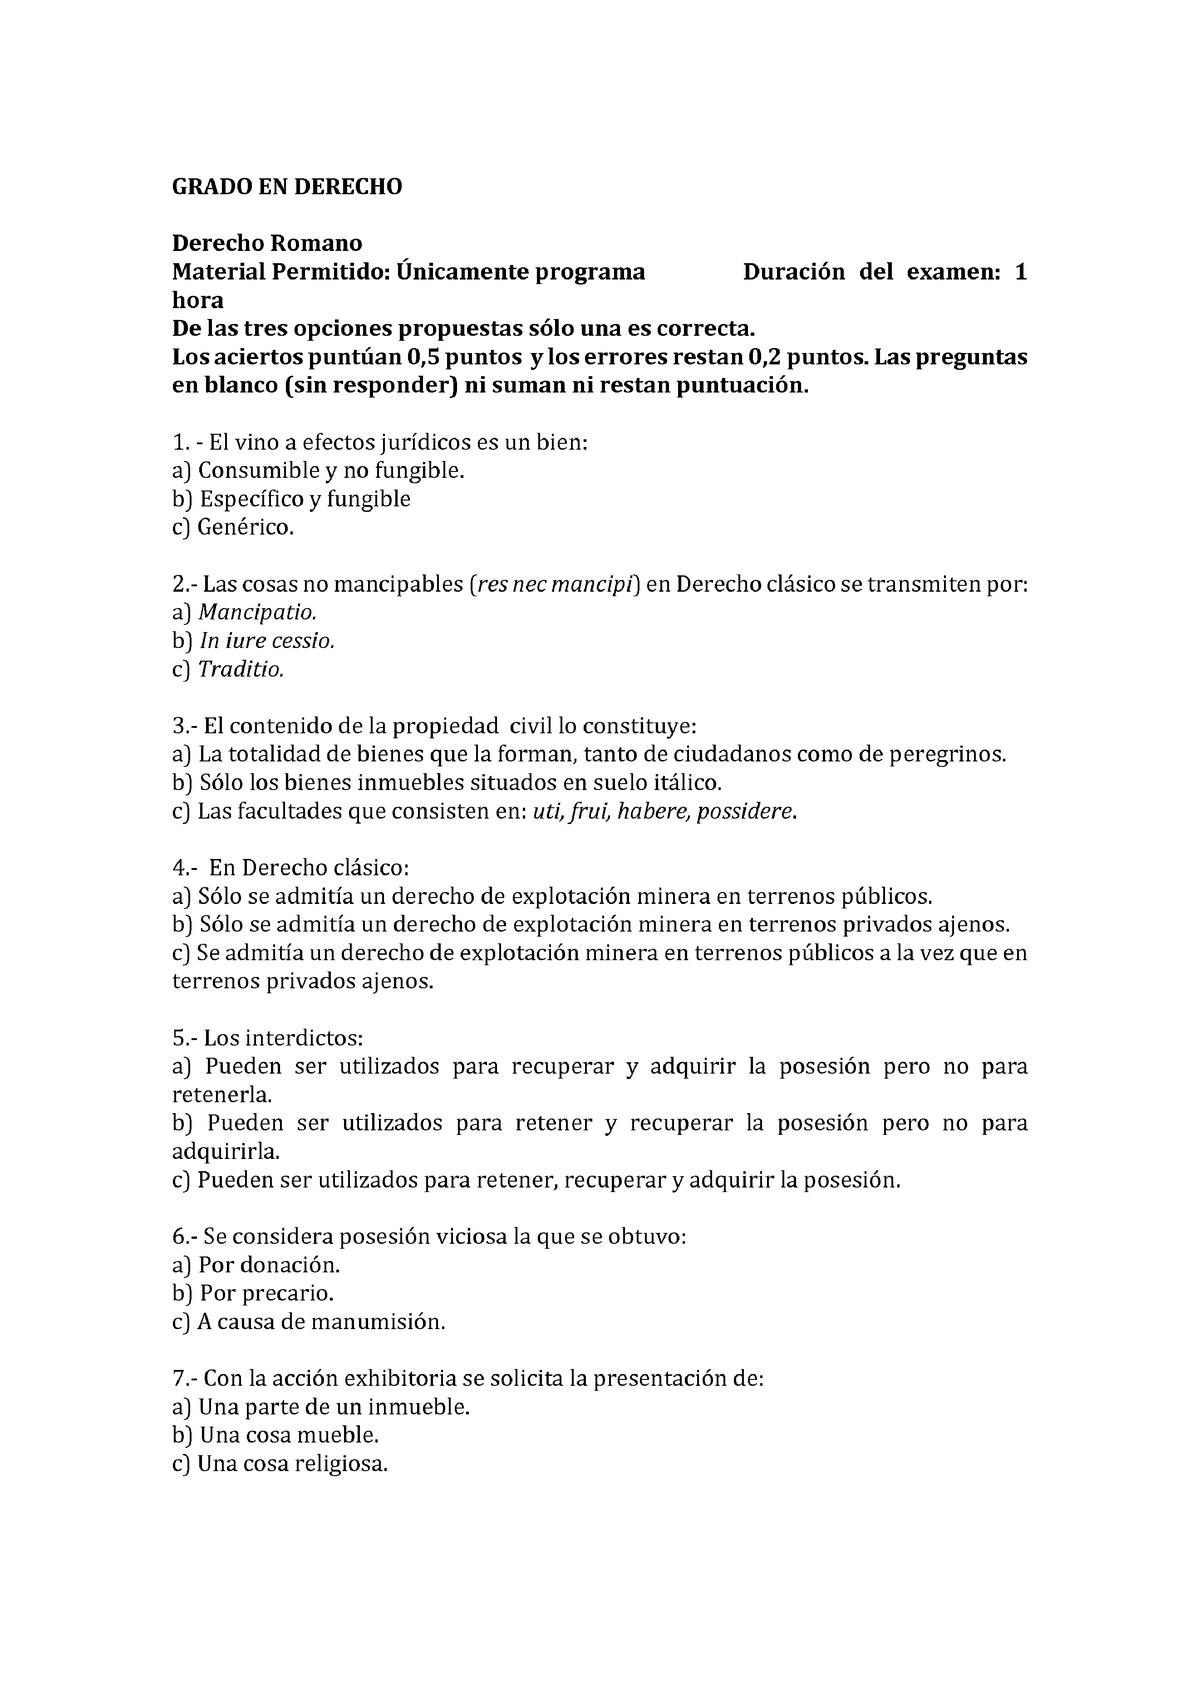 Examen Mayo 2017 Preguntas Studocu